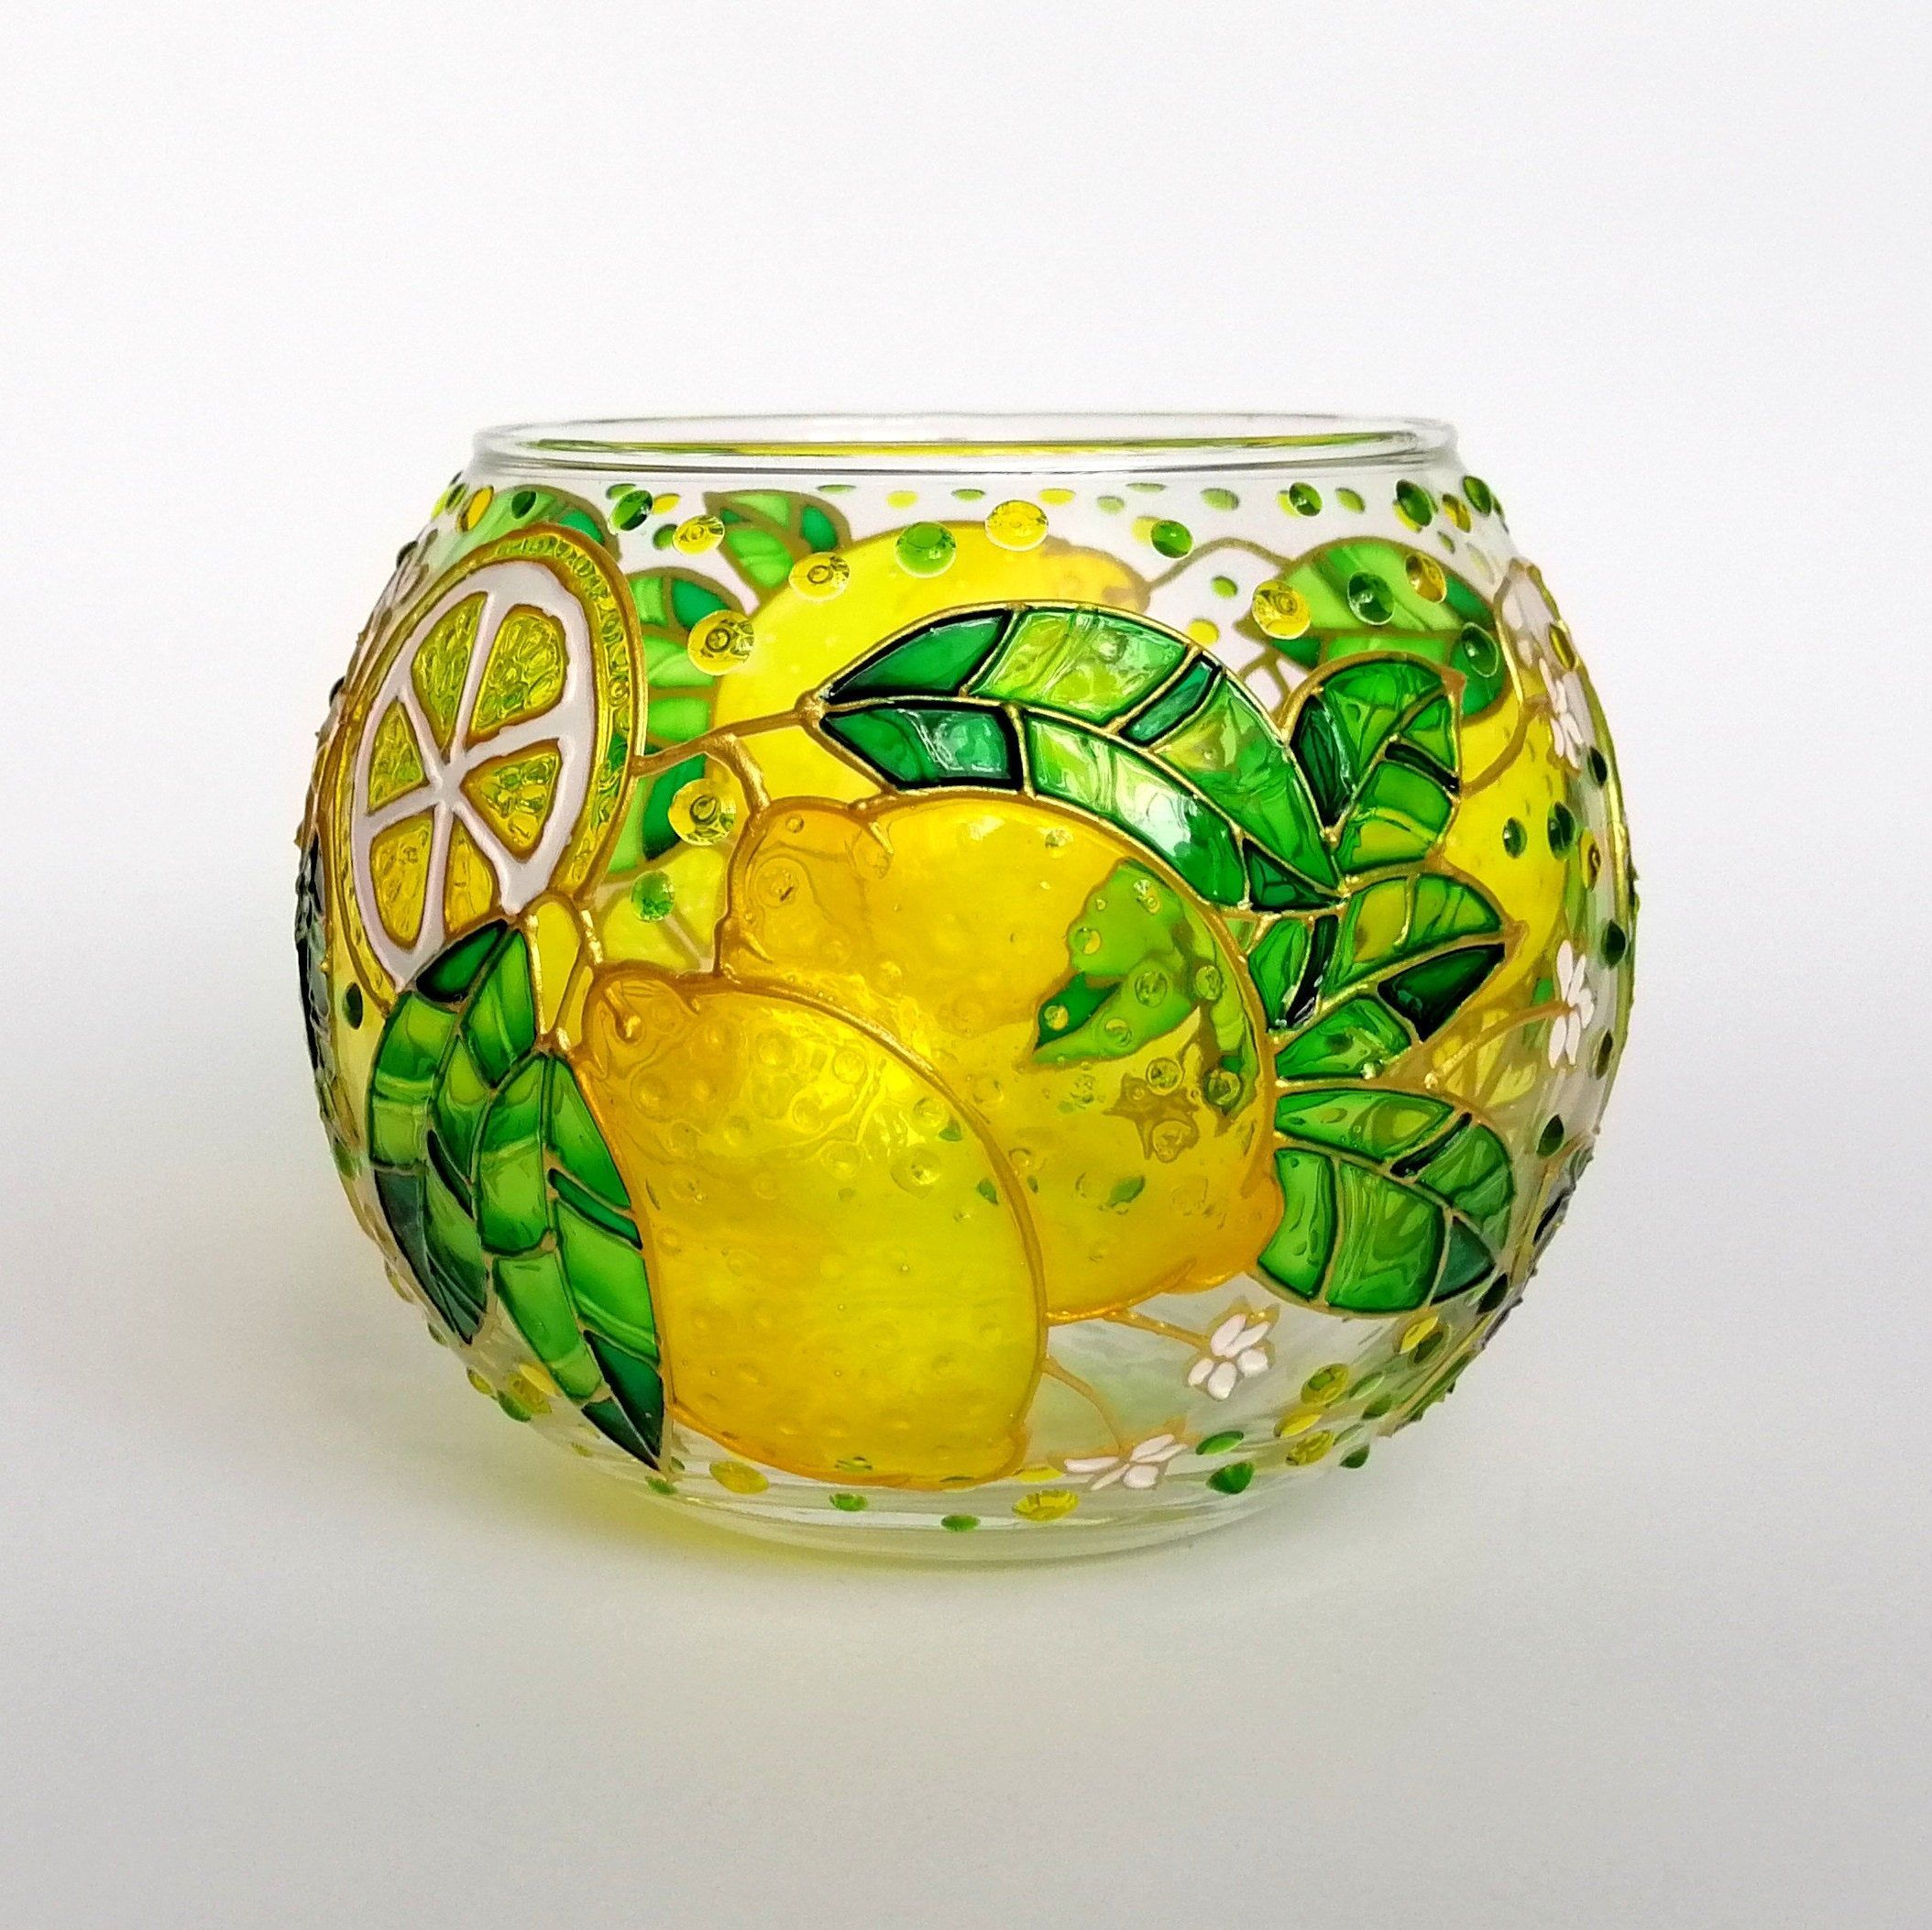 Lemon candle holder Hand painted glass candle holder wedding Centerpiece Tea Light Holder Votive ca